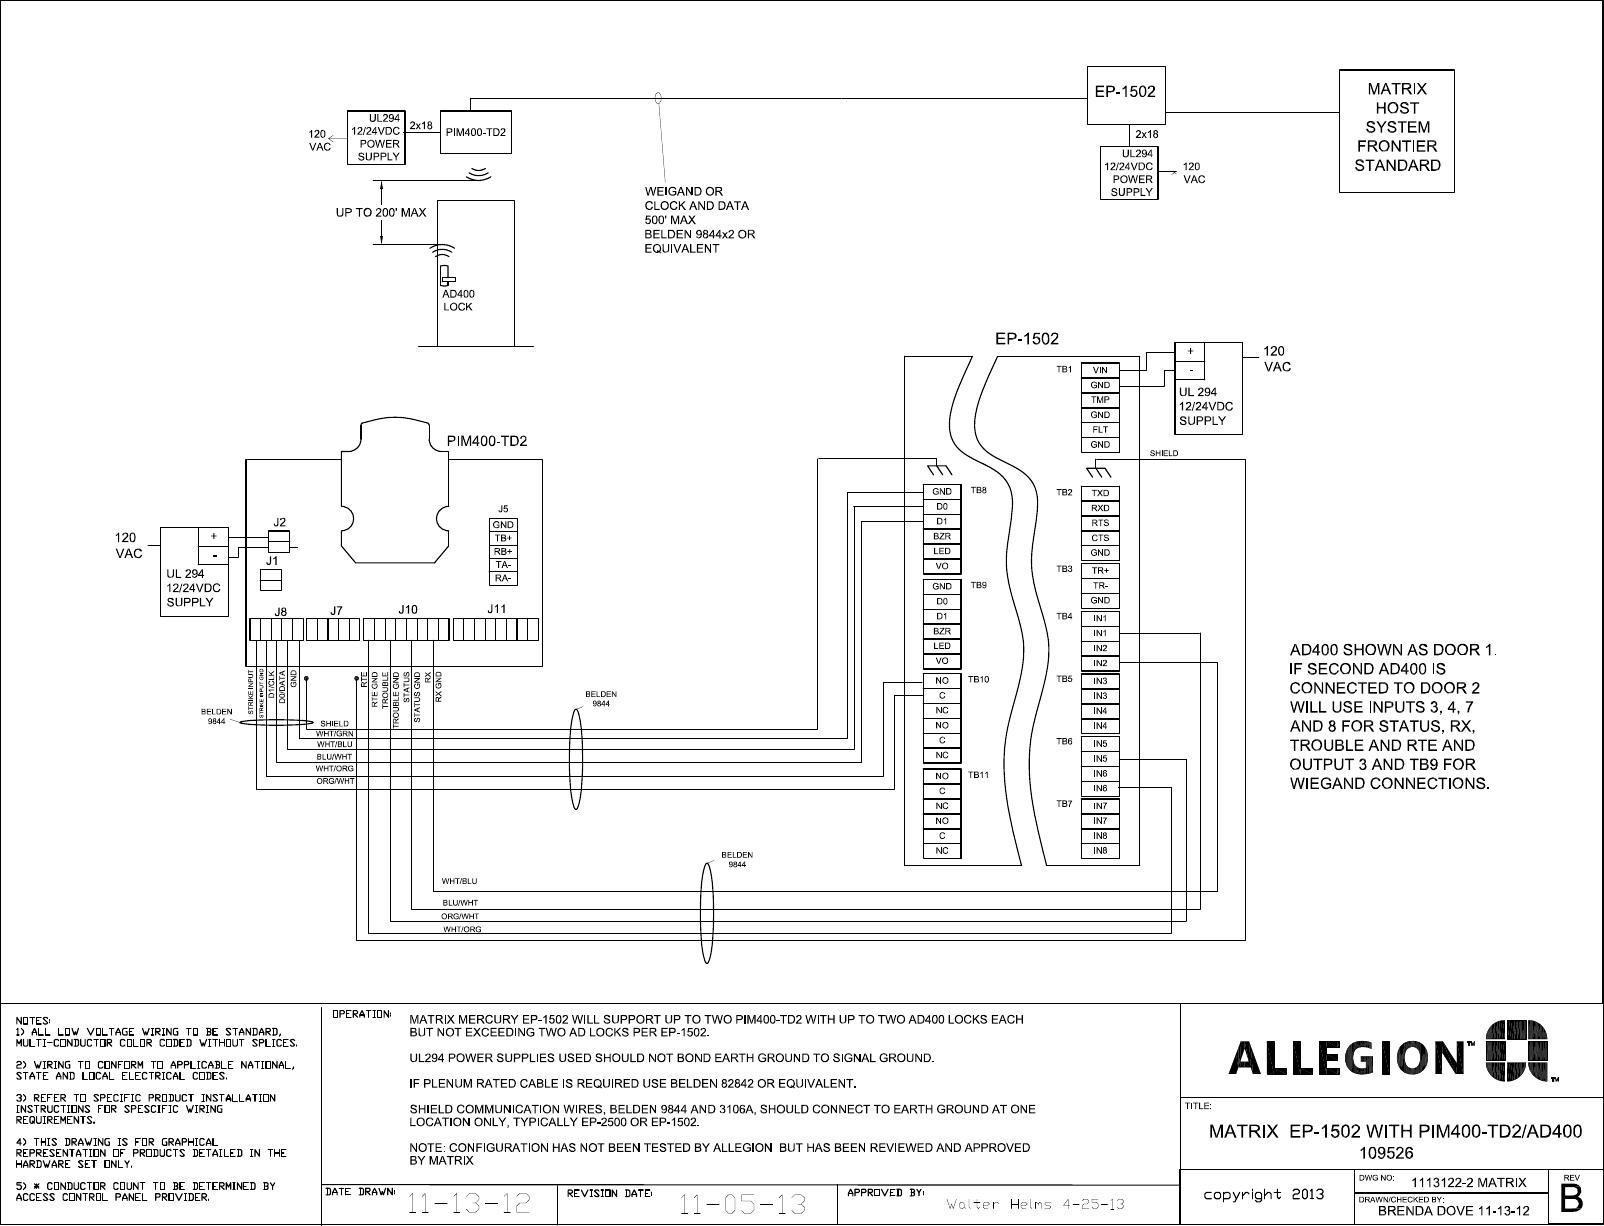 Schlage Electronics C Ad400 Matrix Ep1502 Wiegand Wiring Diagram 109526